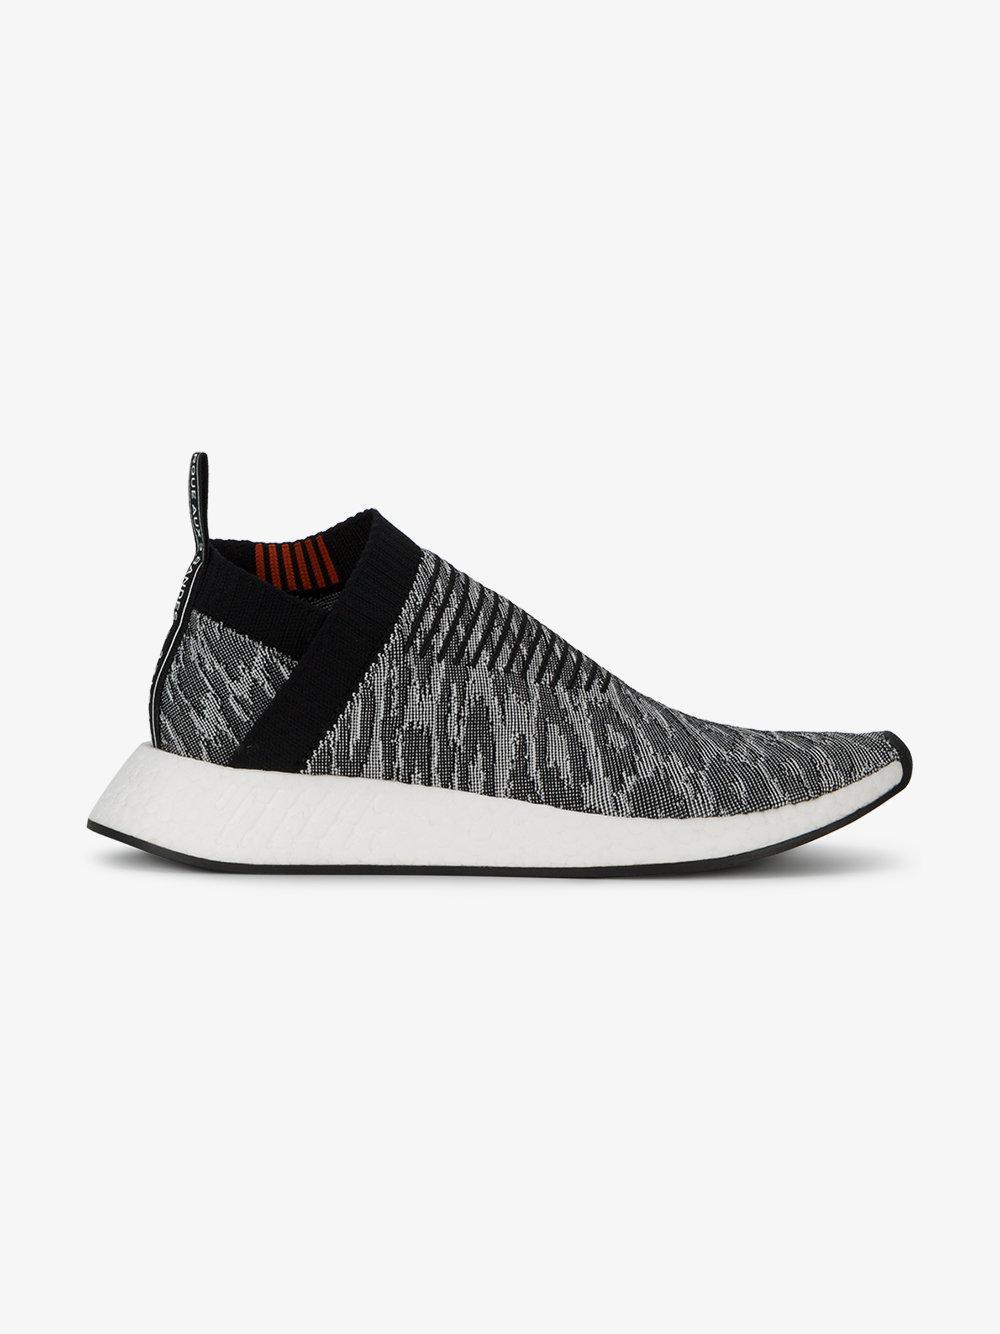 adidas Originals Leopard NMD CS2 Primeknit sneakers 87v1TI